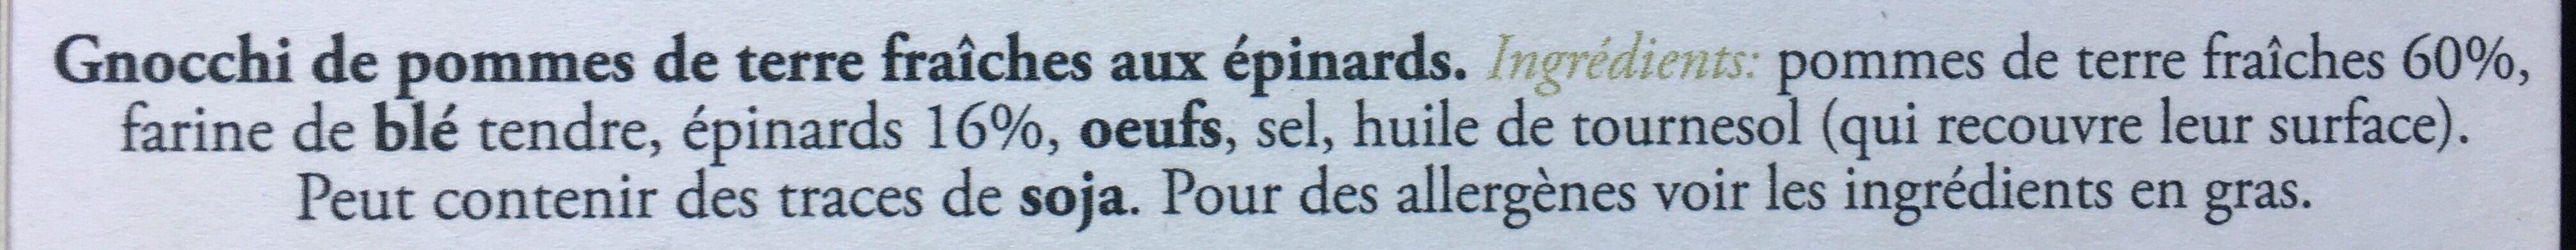 Gnocchi rigati aux epinards - Ingrediënten